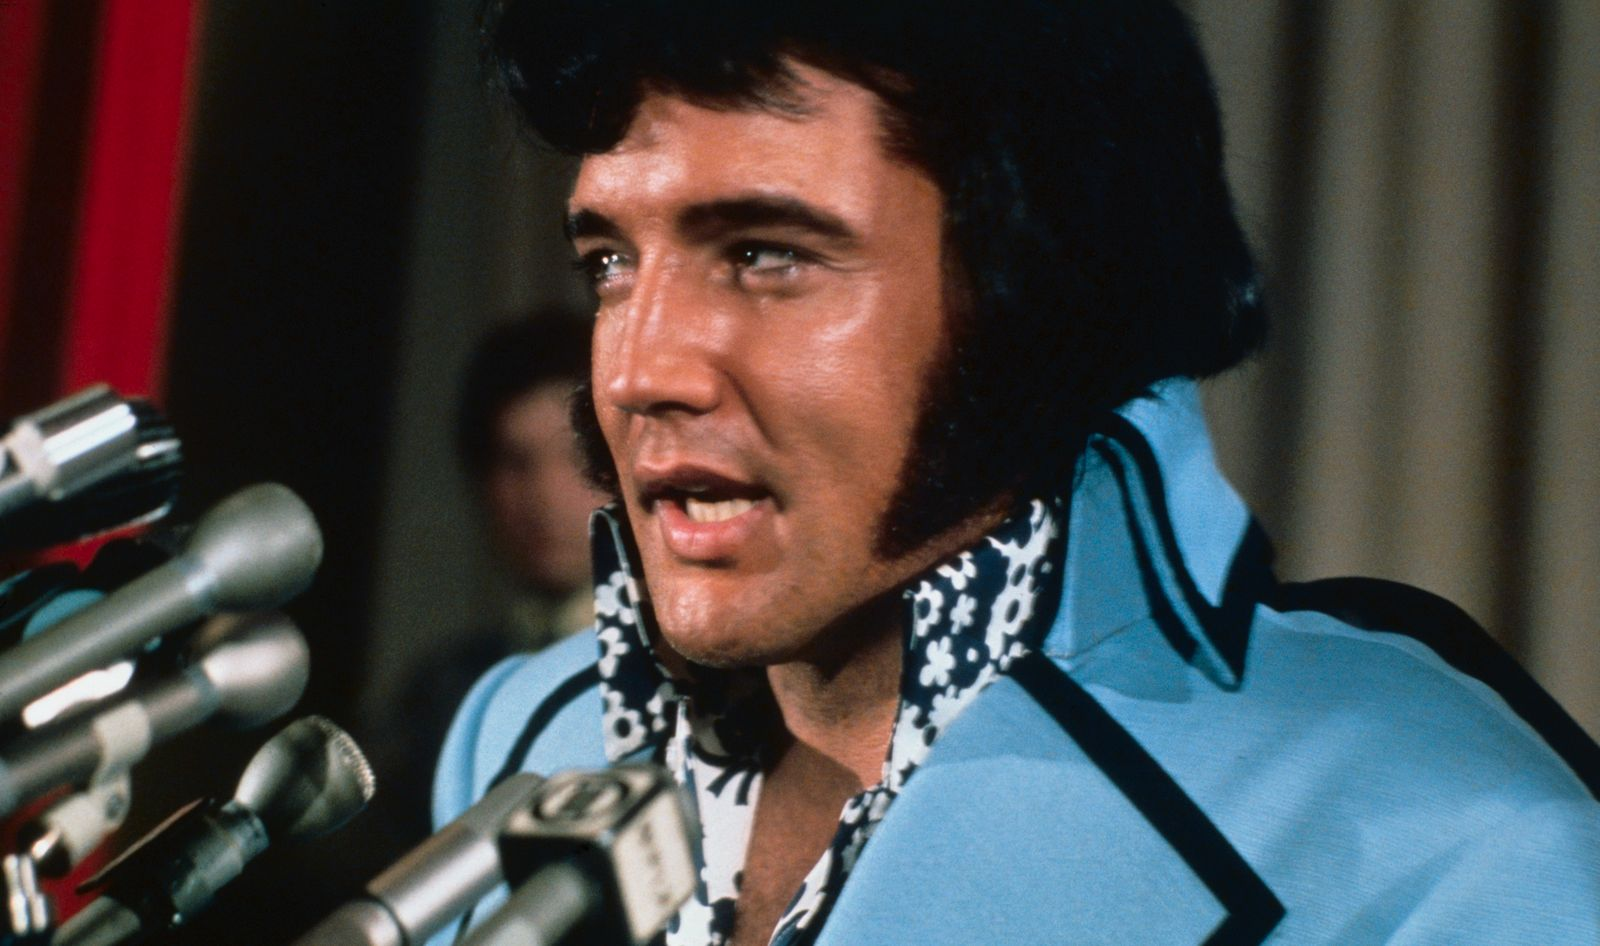 Elvis Presley Speaking at News Conference